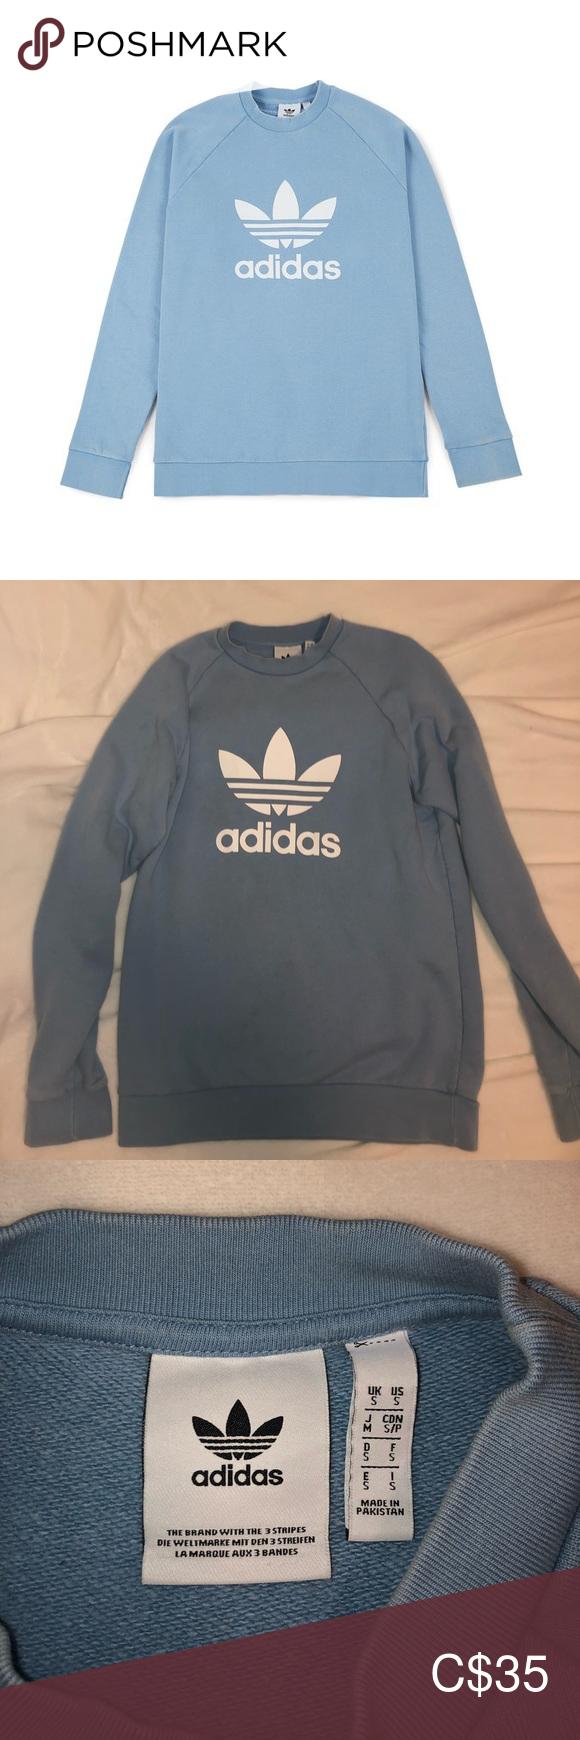 Adidas Crew Neck Adidas Crew Neck Blue Adidas Adidas Sweater [ 1740 x 580 Pixel ]